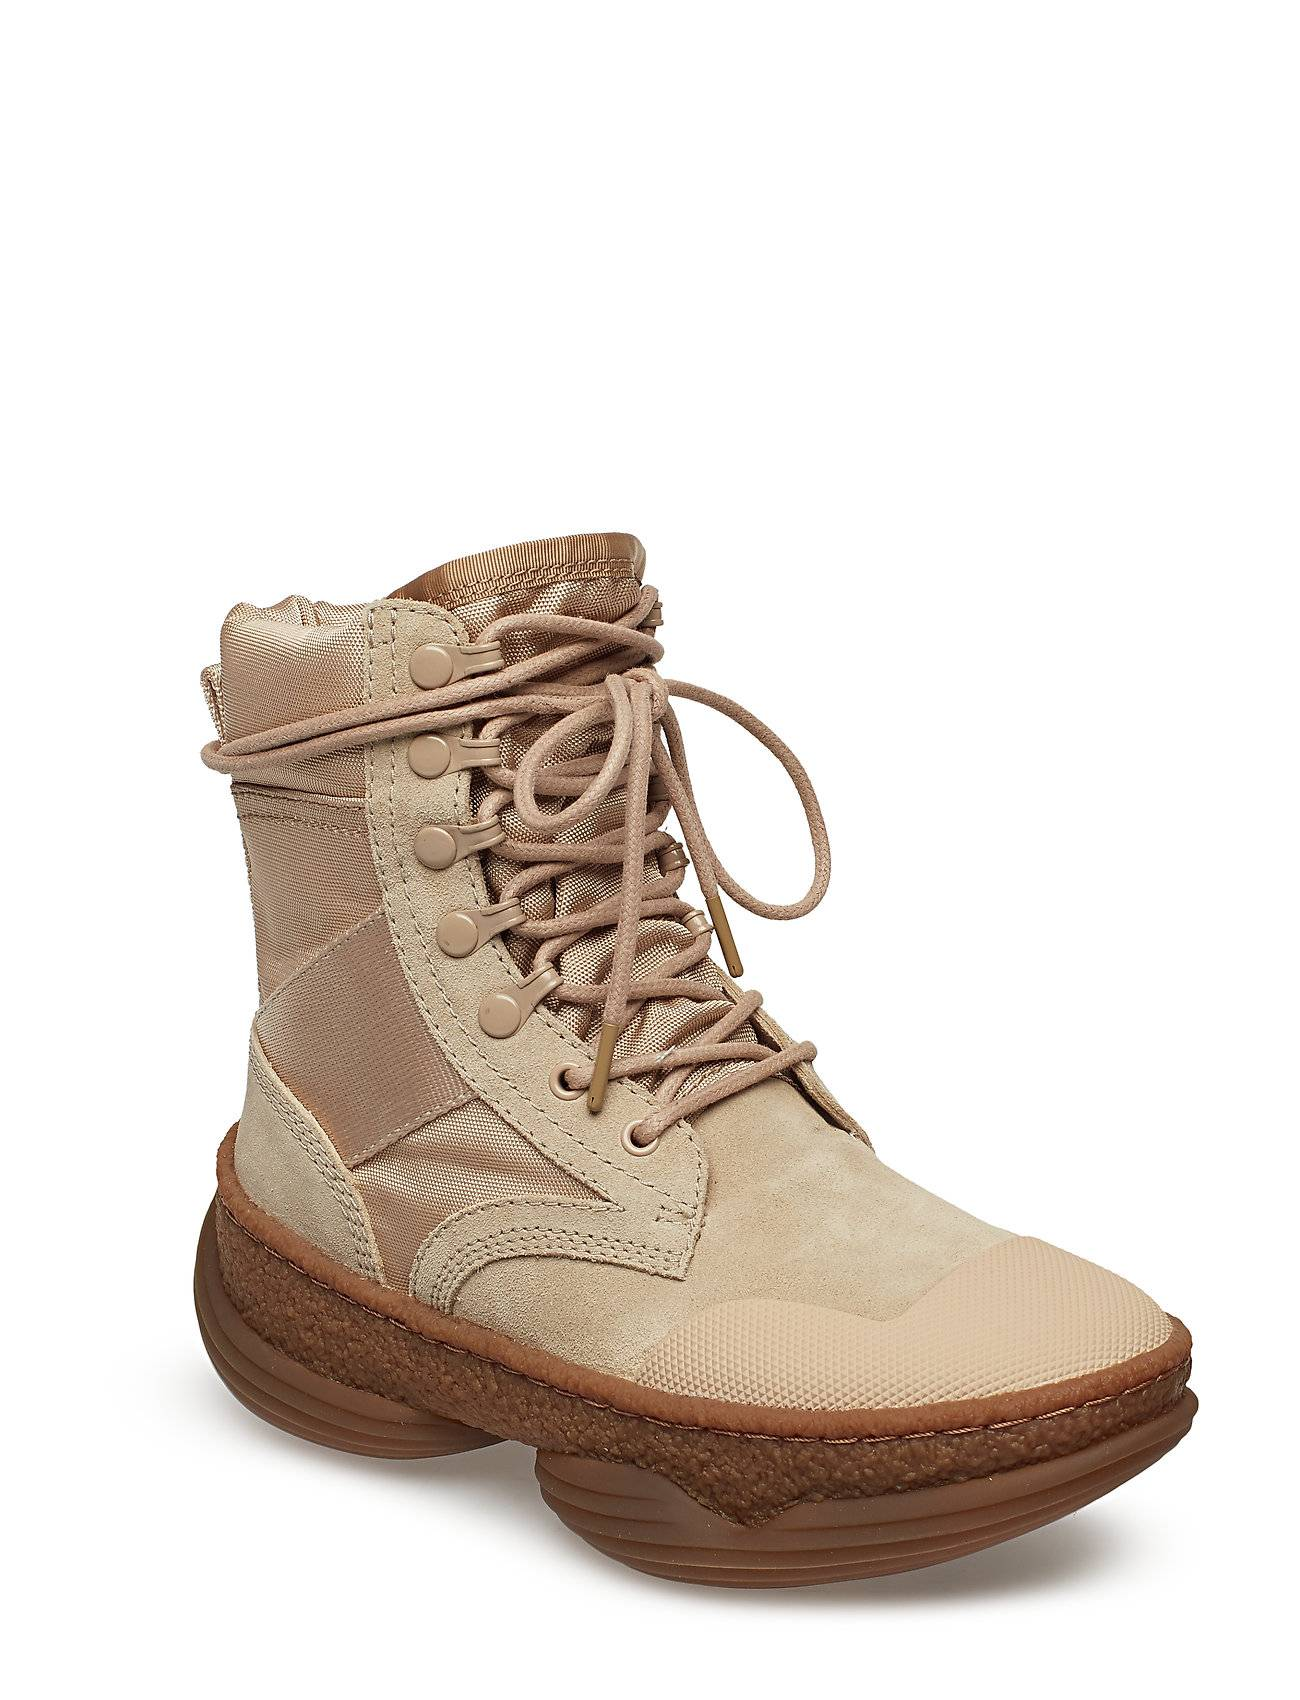 Alexander Wang A1 Combat Boot Sand Suede/Canvas